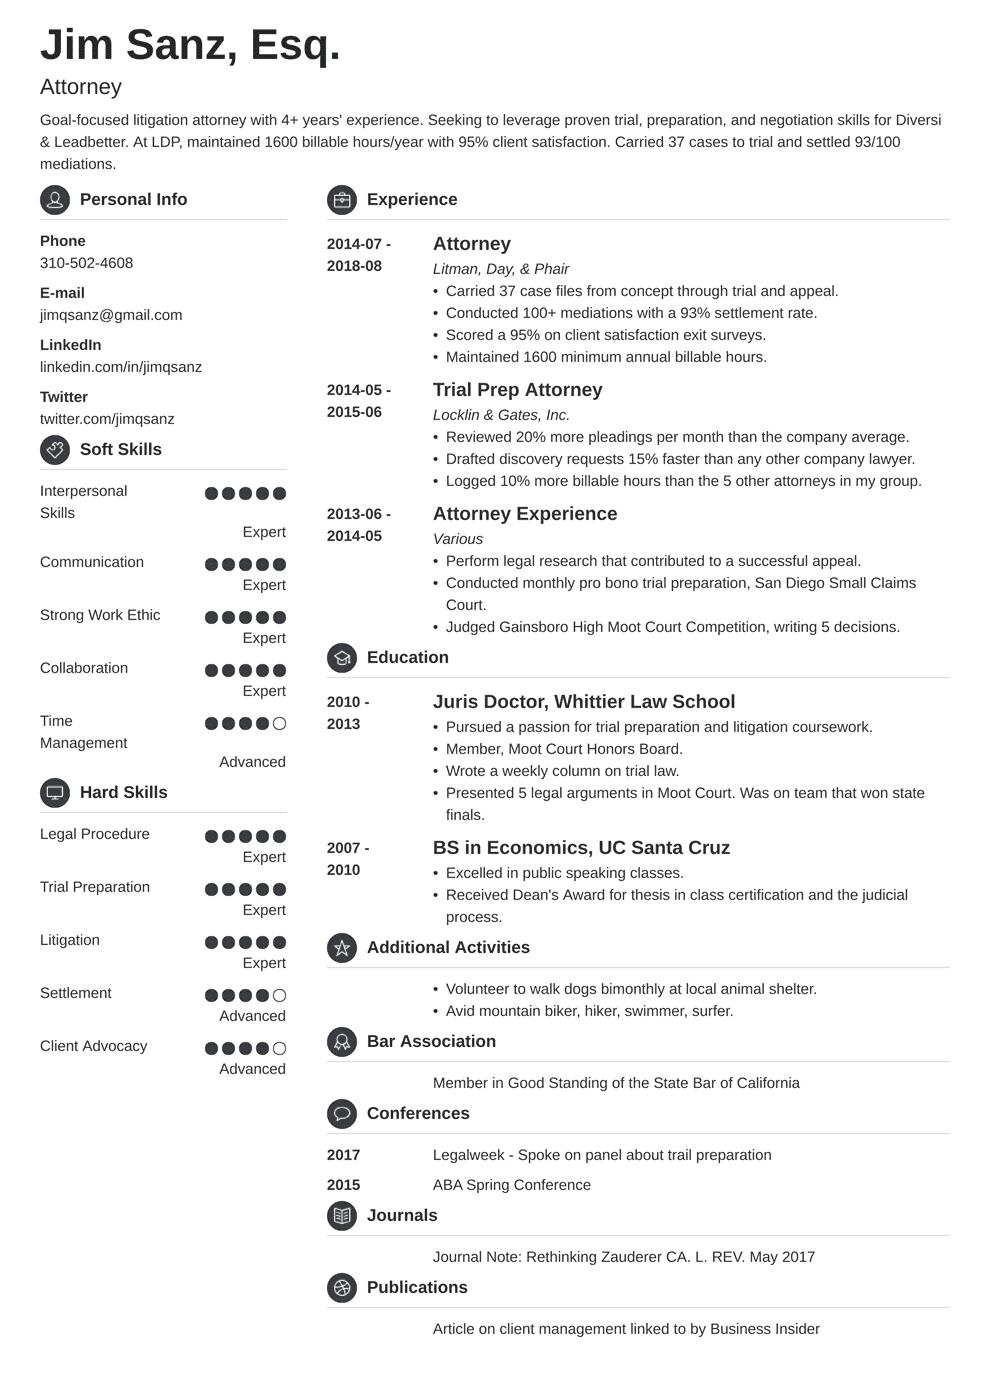 attorney resume template crisp in 2020 Resume examples